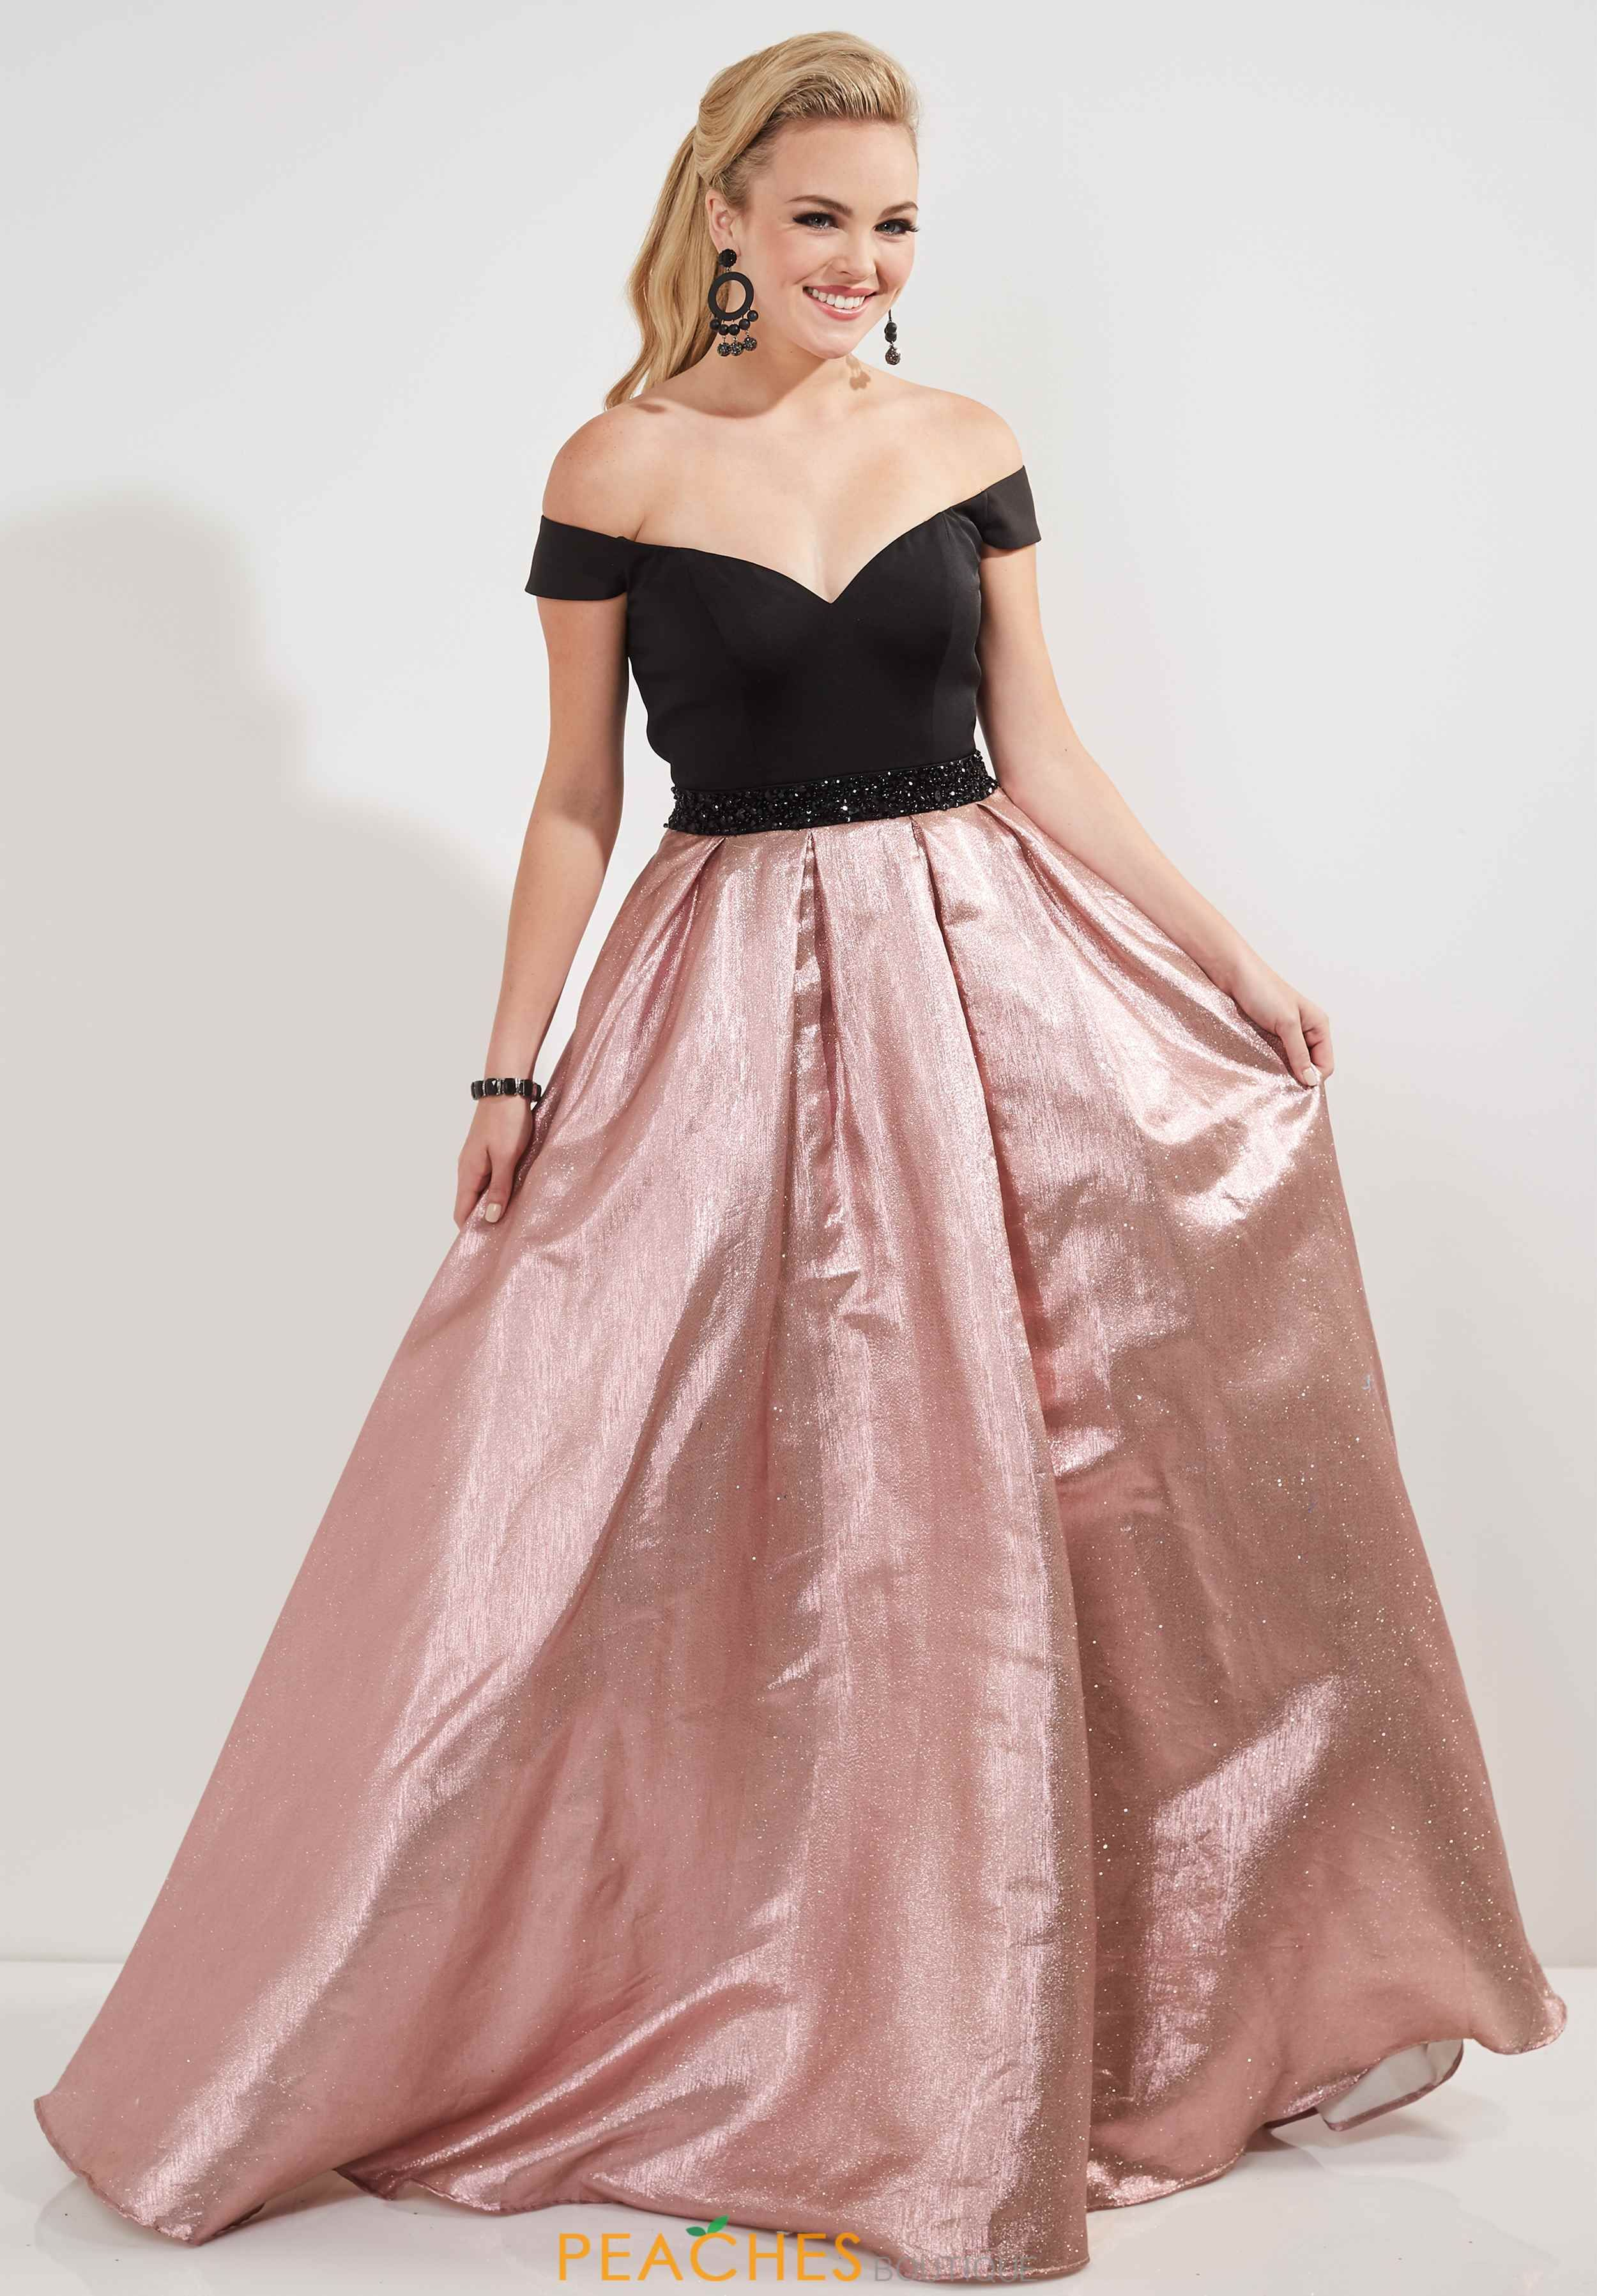 81e2950aa06 Pink Black White Prom Dress - Data Dynamic AG